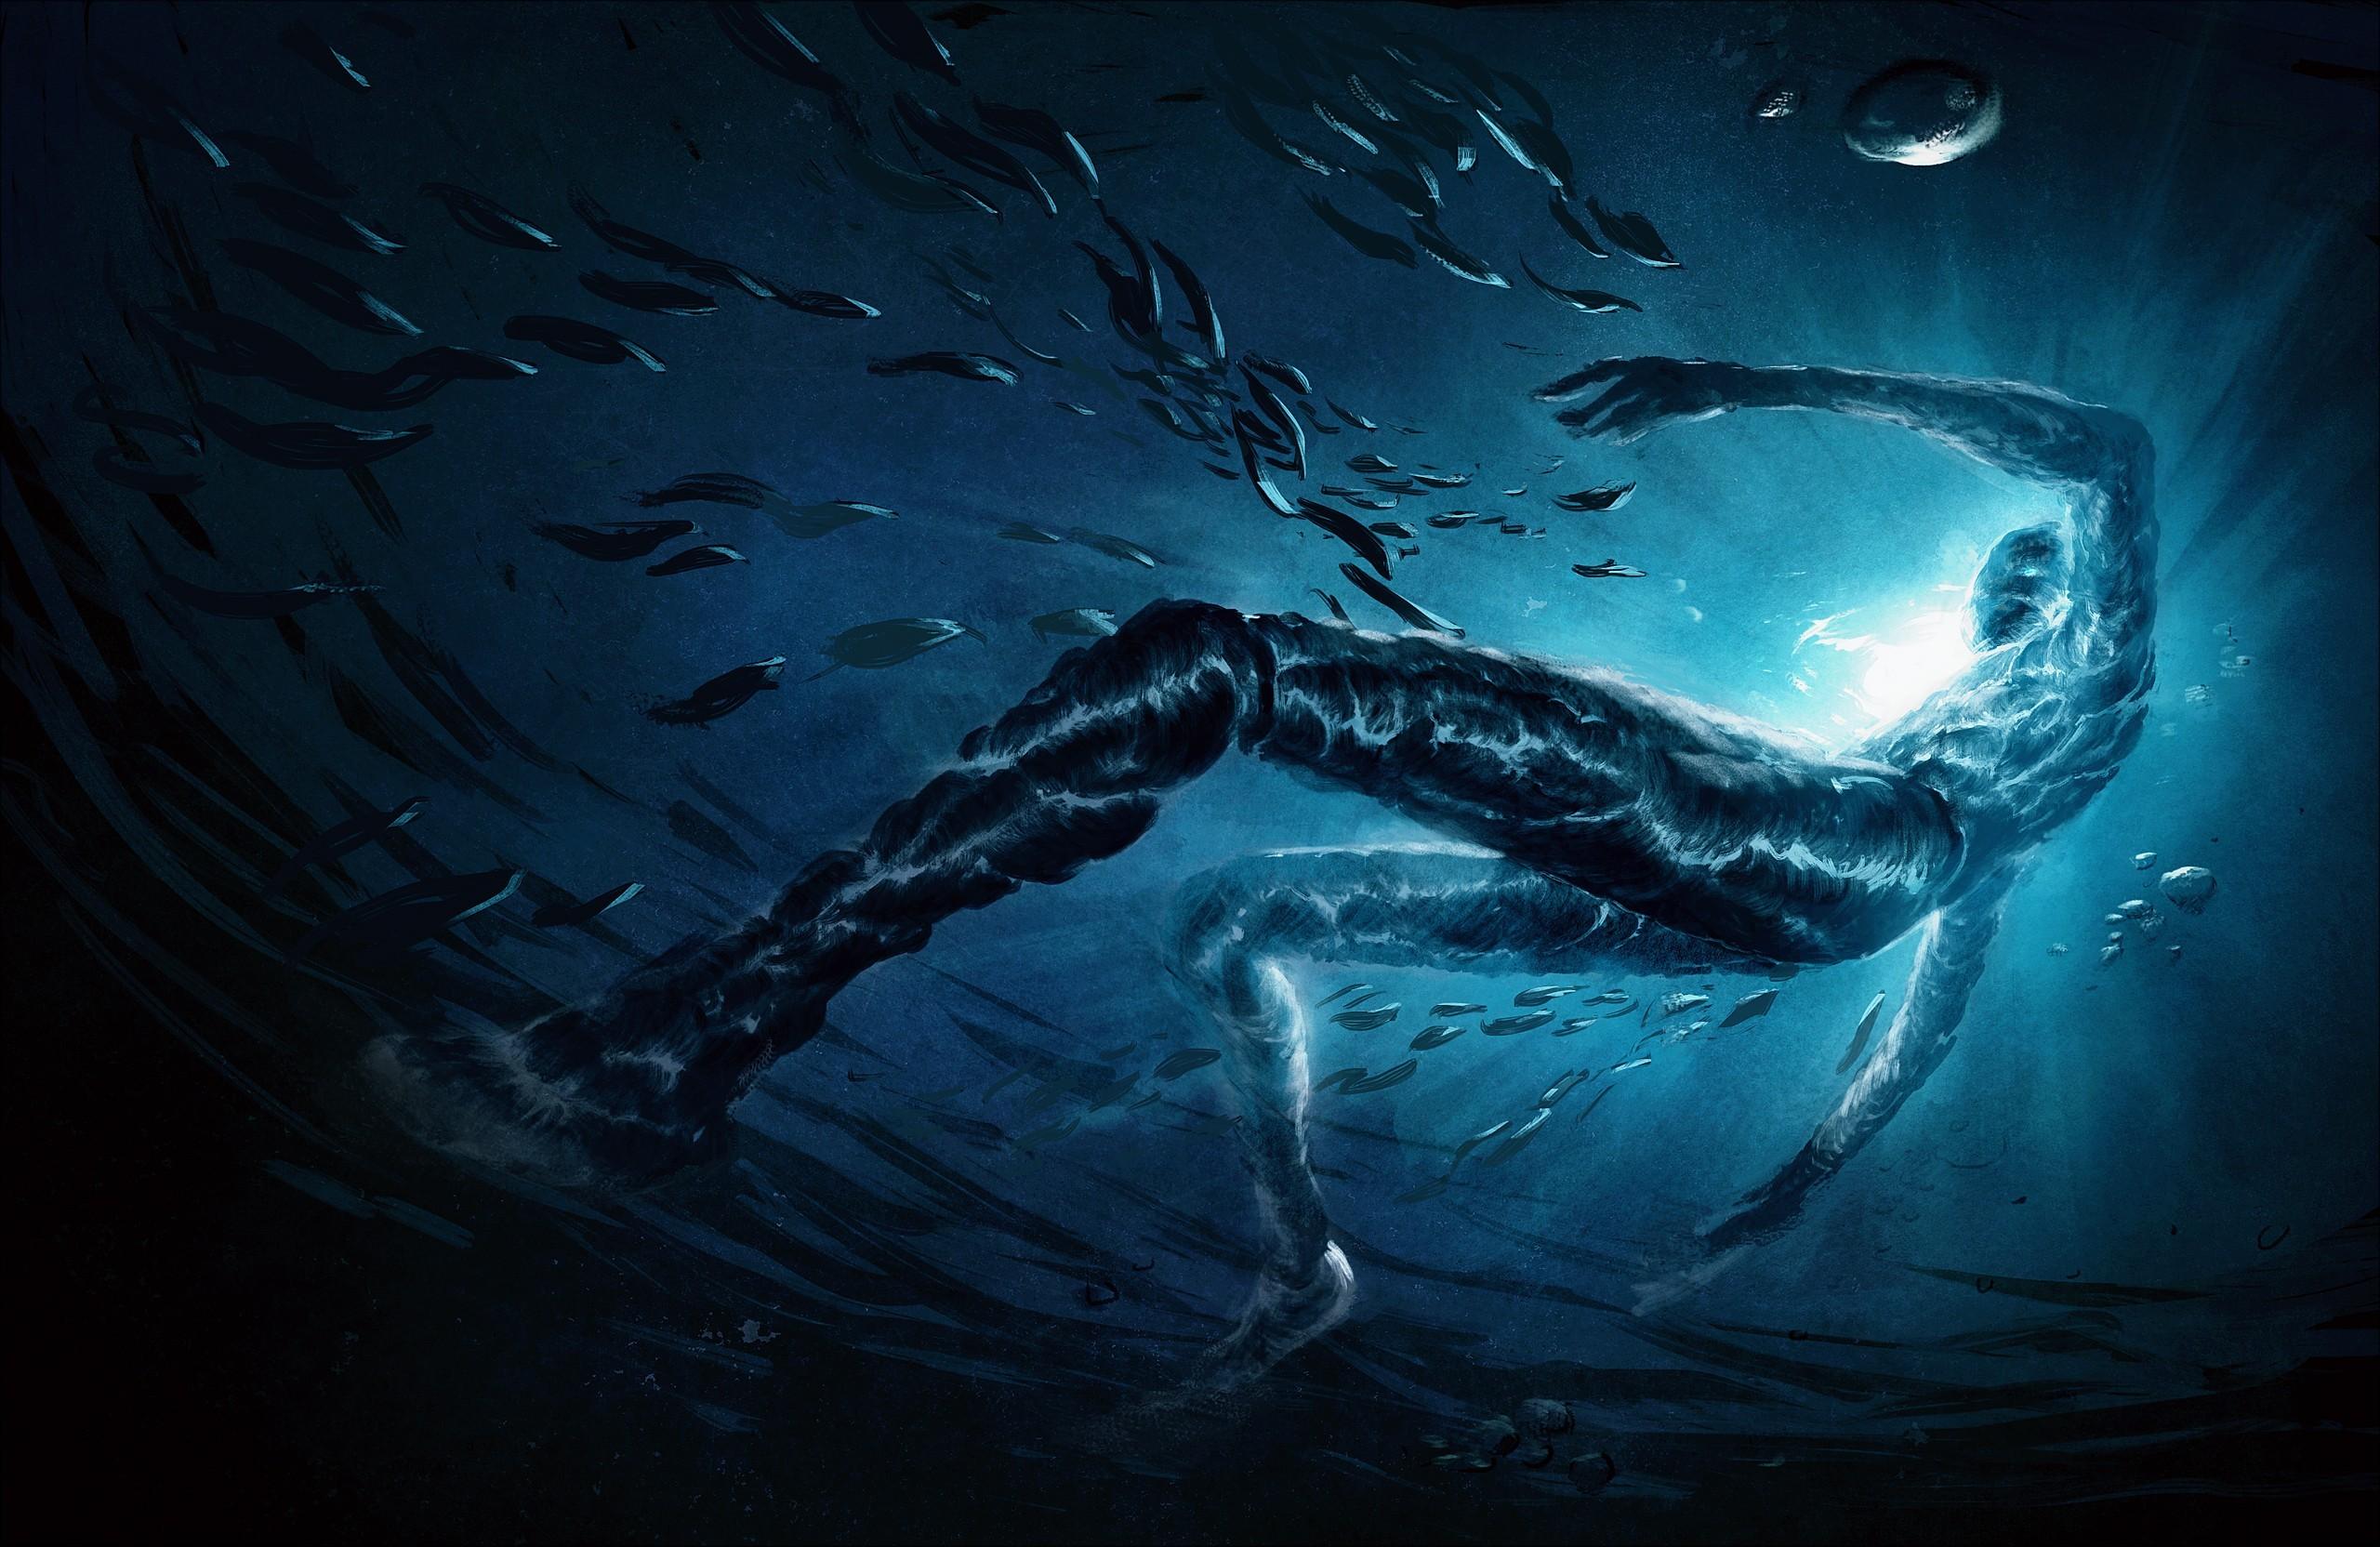 Wallpaper Men Fantasy Art Water Underwater Ghost Ship